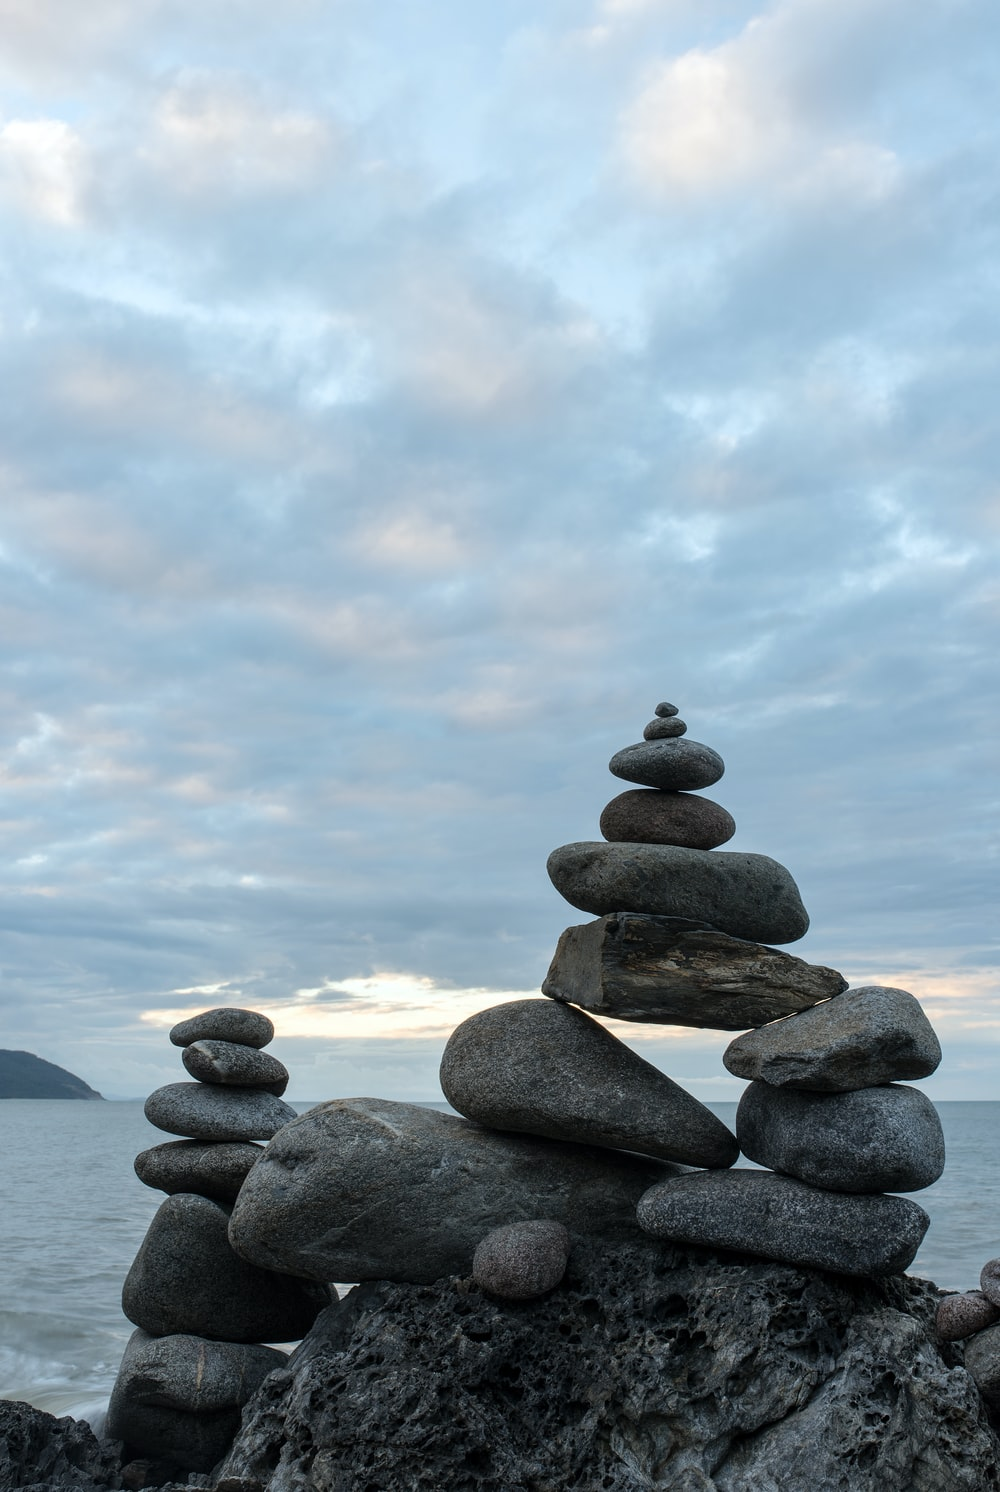 balanced stones on rock beside the ocean